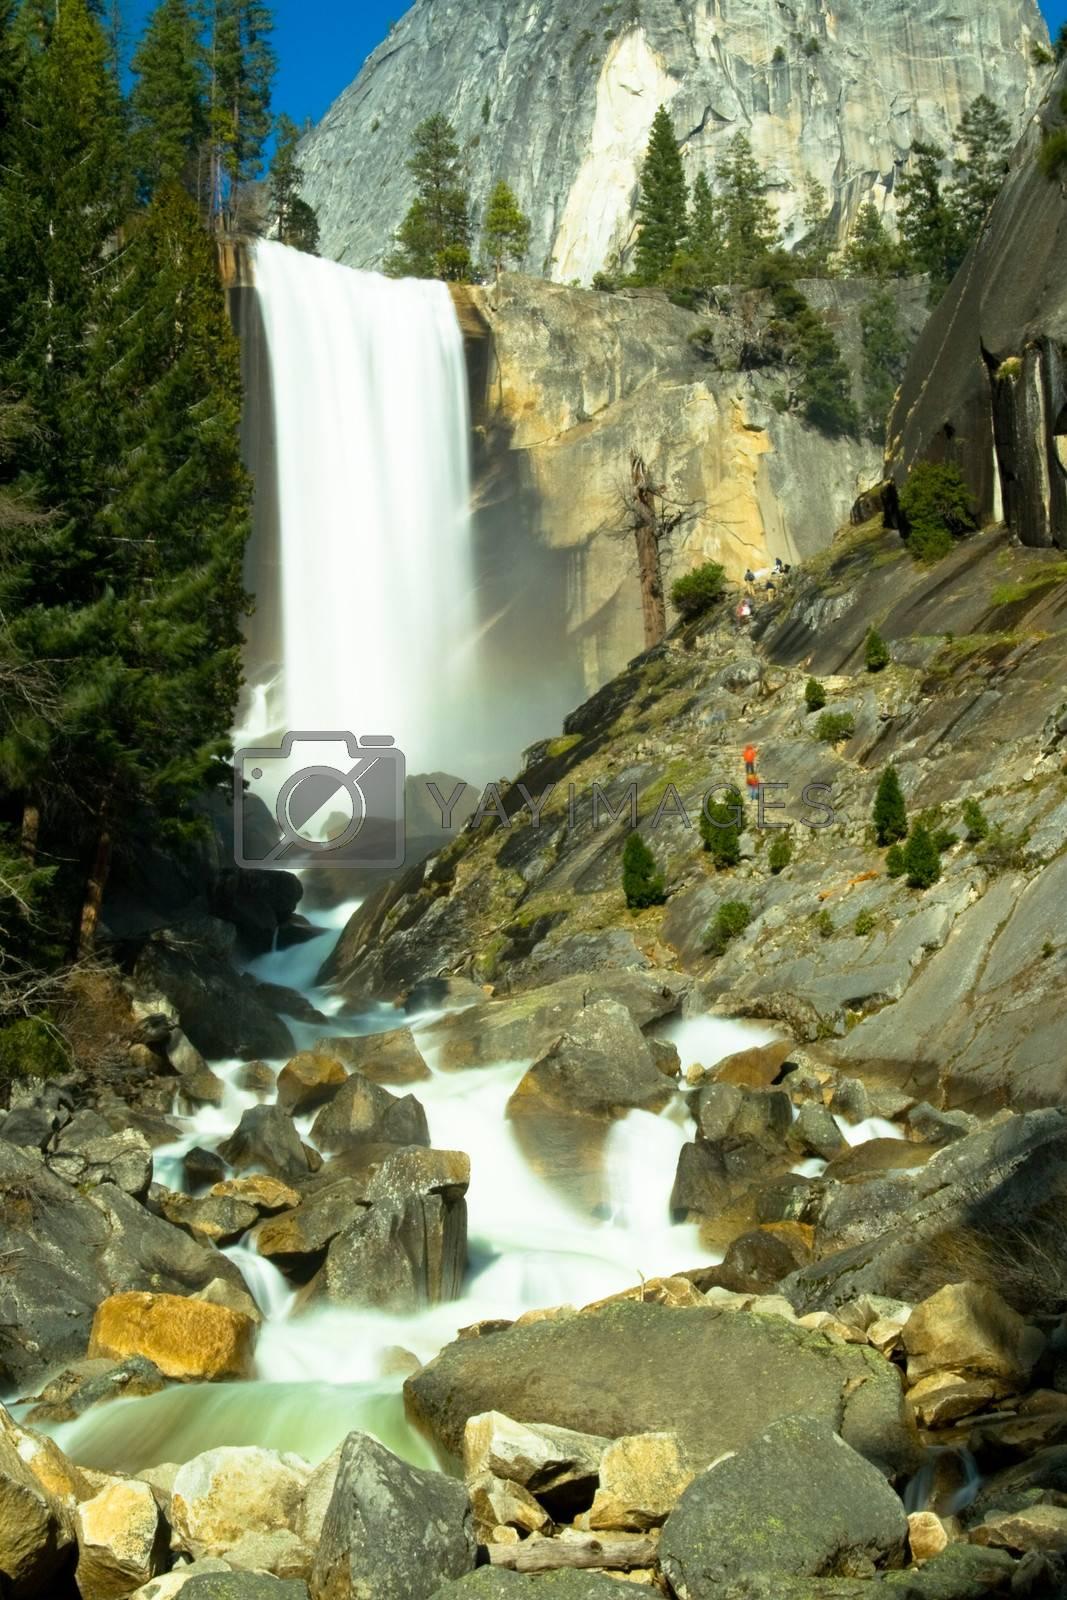 Water falling from rocks in a river, Yosemite Mist Trail, Vernal Falls, Yosemite National Park, California, USA